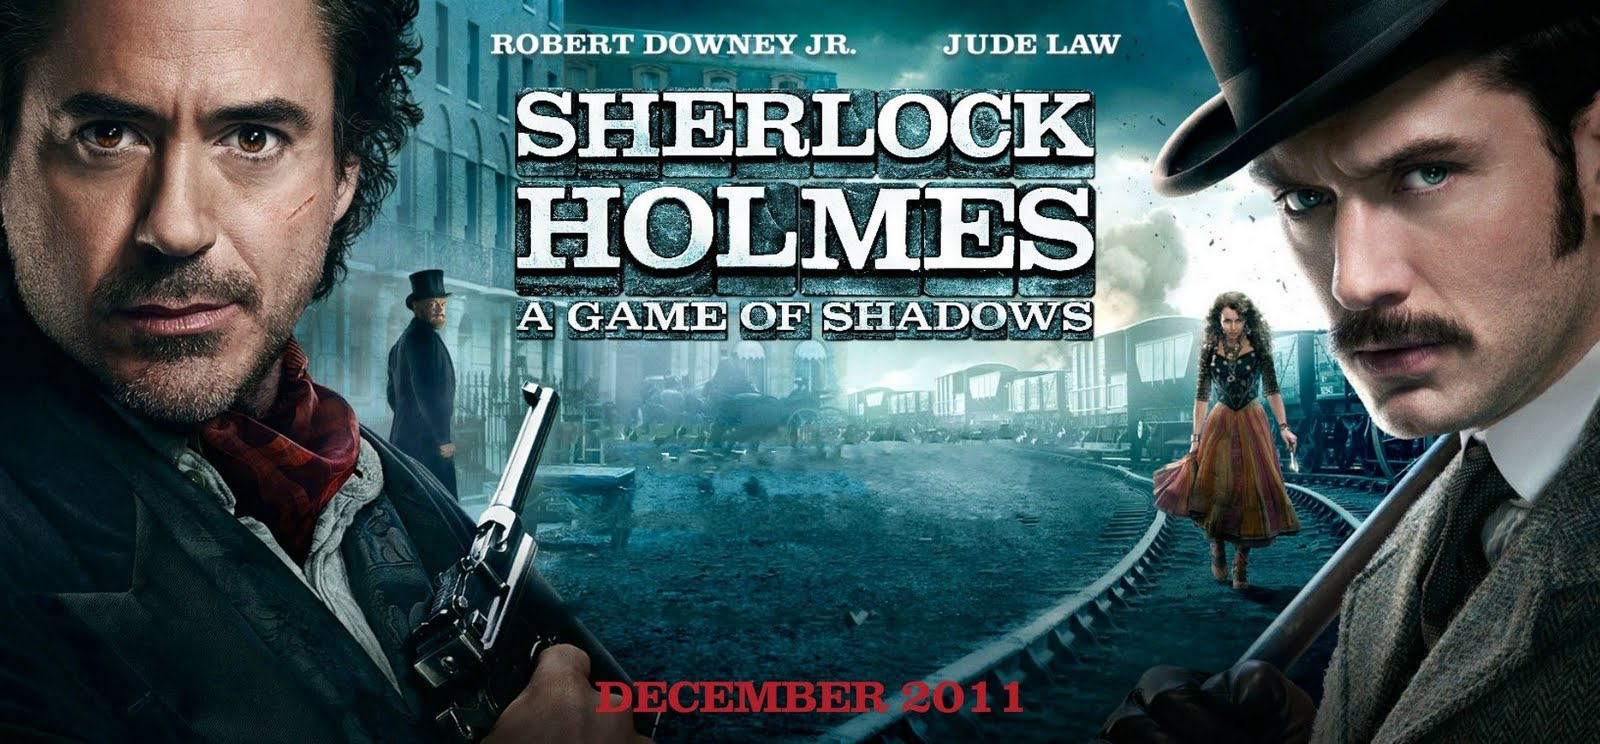 sherlock holmes 2 a game of shadows